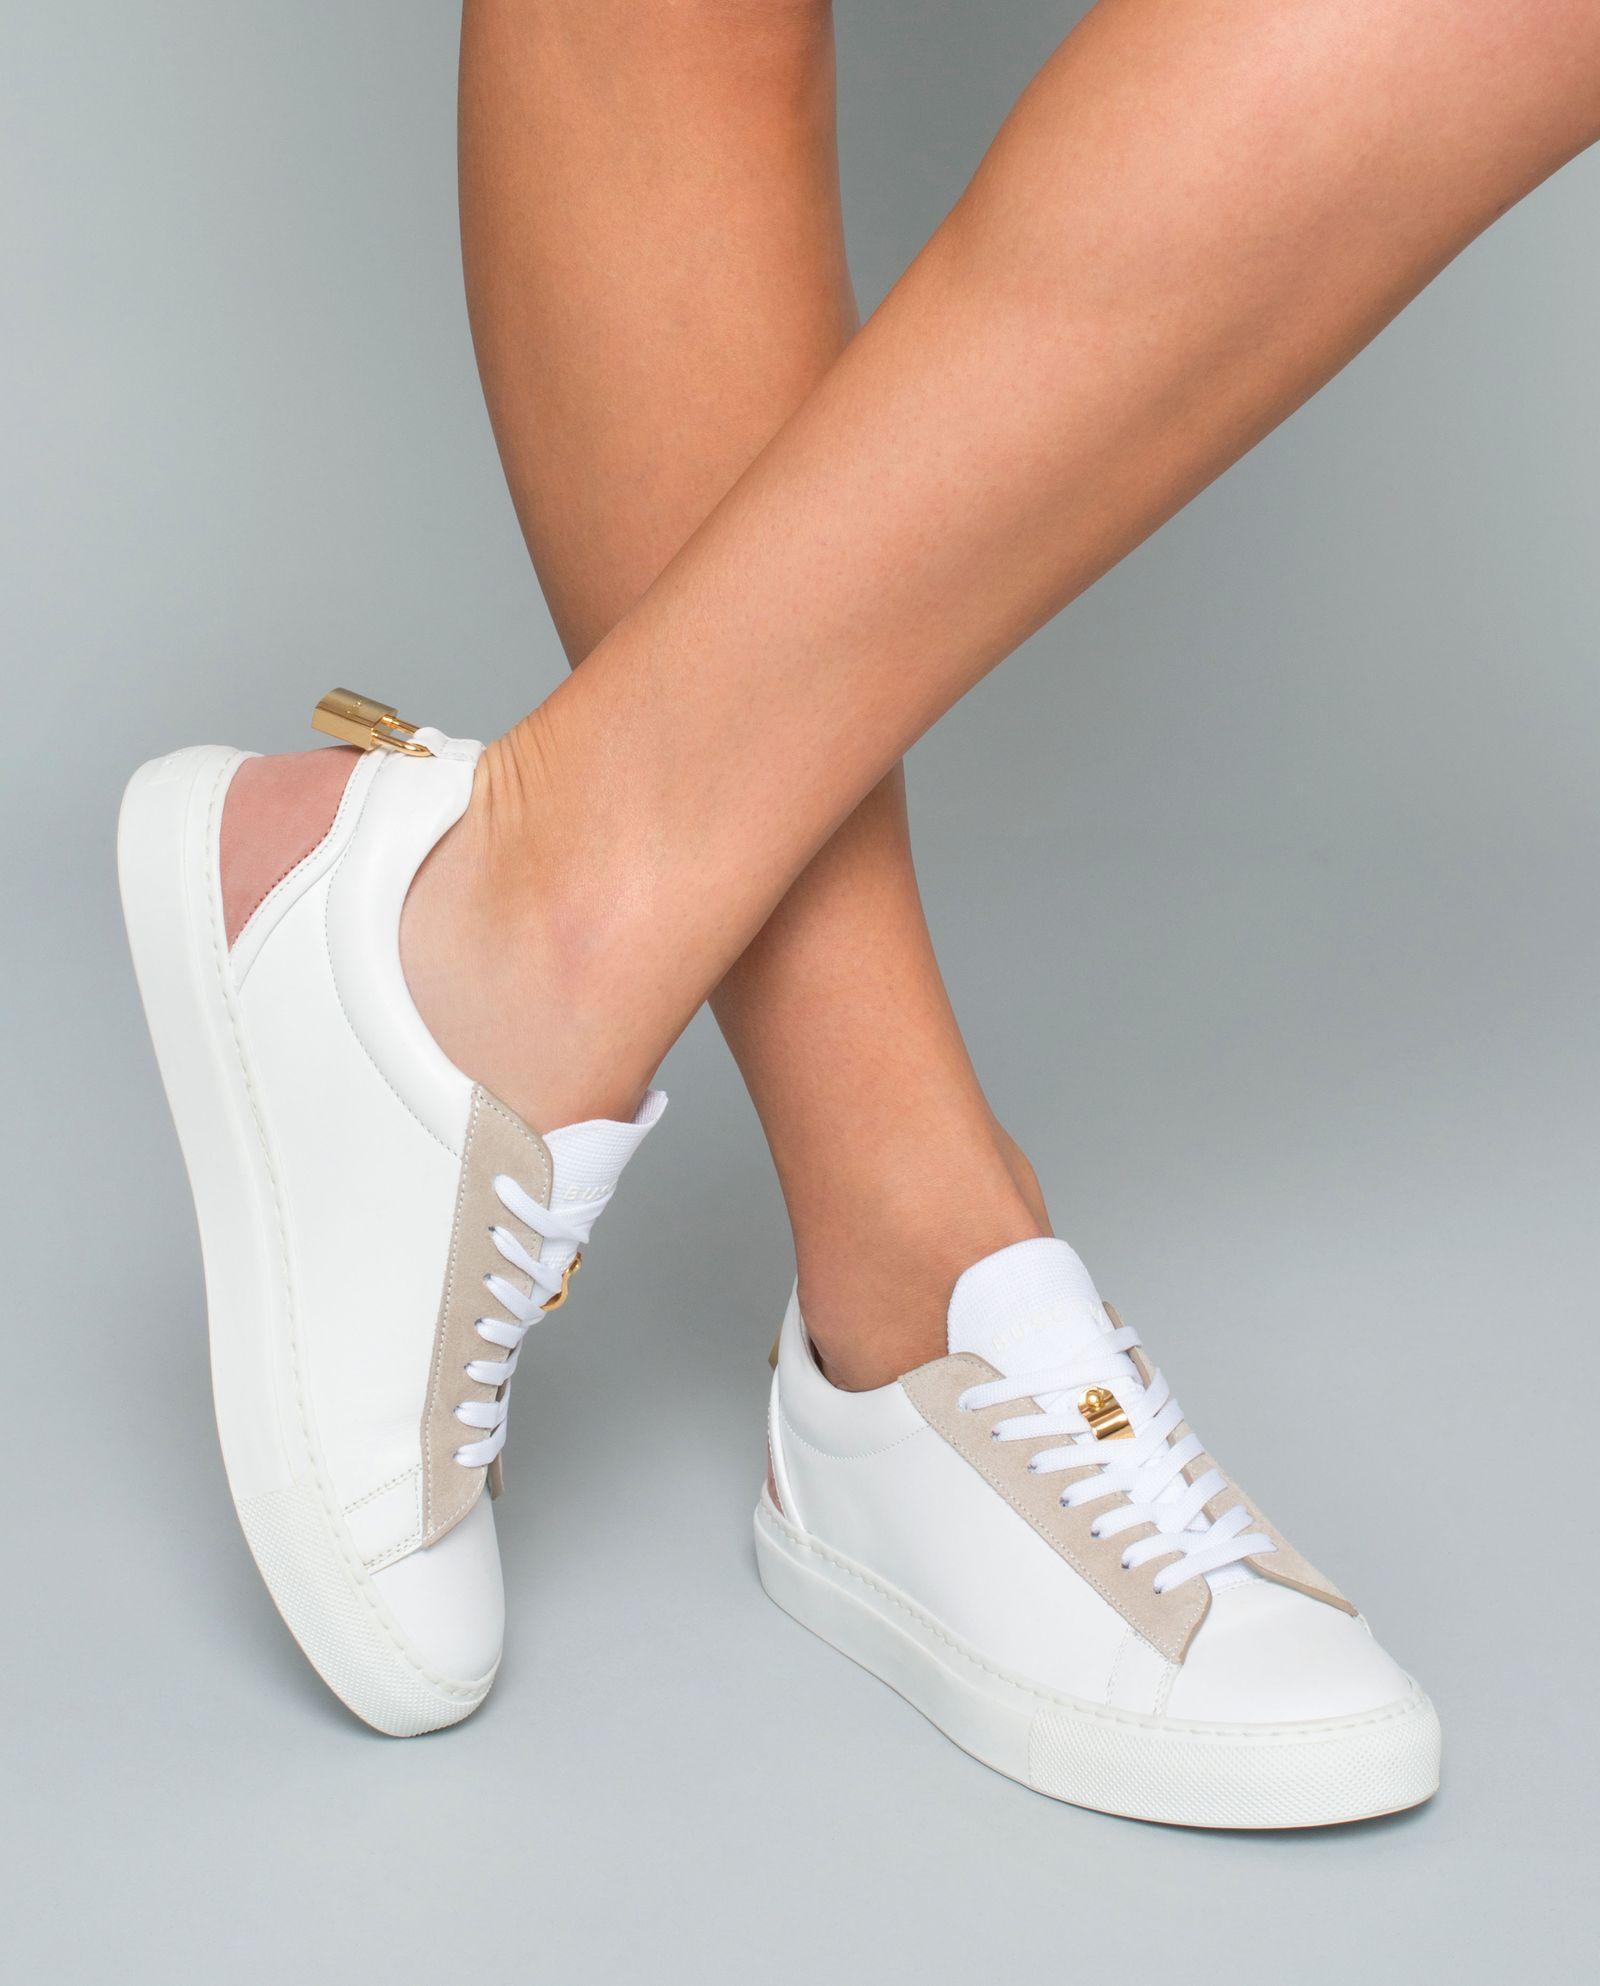 Sneakersy tennis lock BUSCEMI – Kup teď! Nejlepší ceny a recenze! Obchod  Moliera2.cz. b2ff1413bb